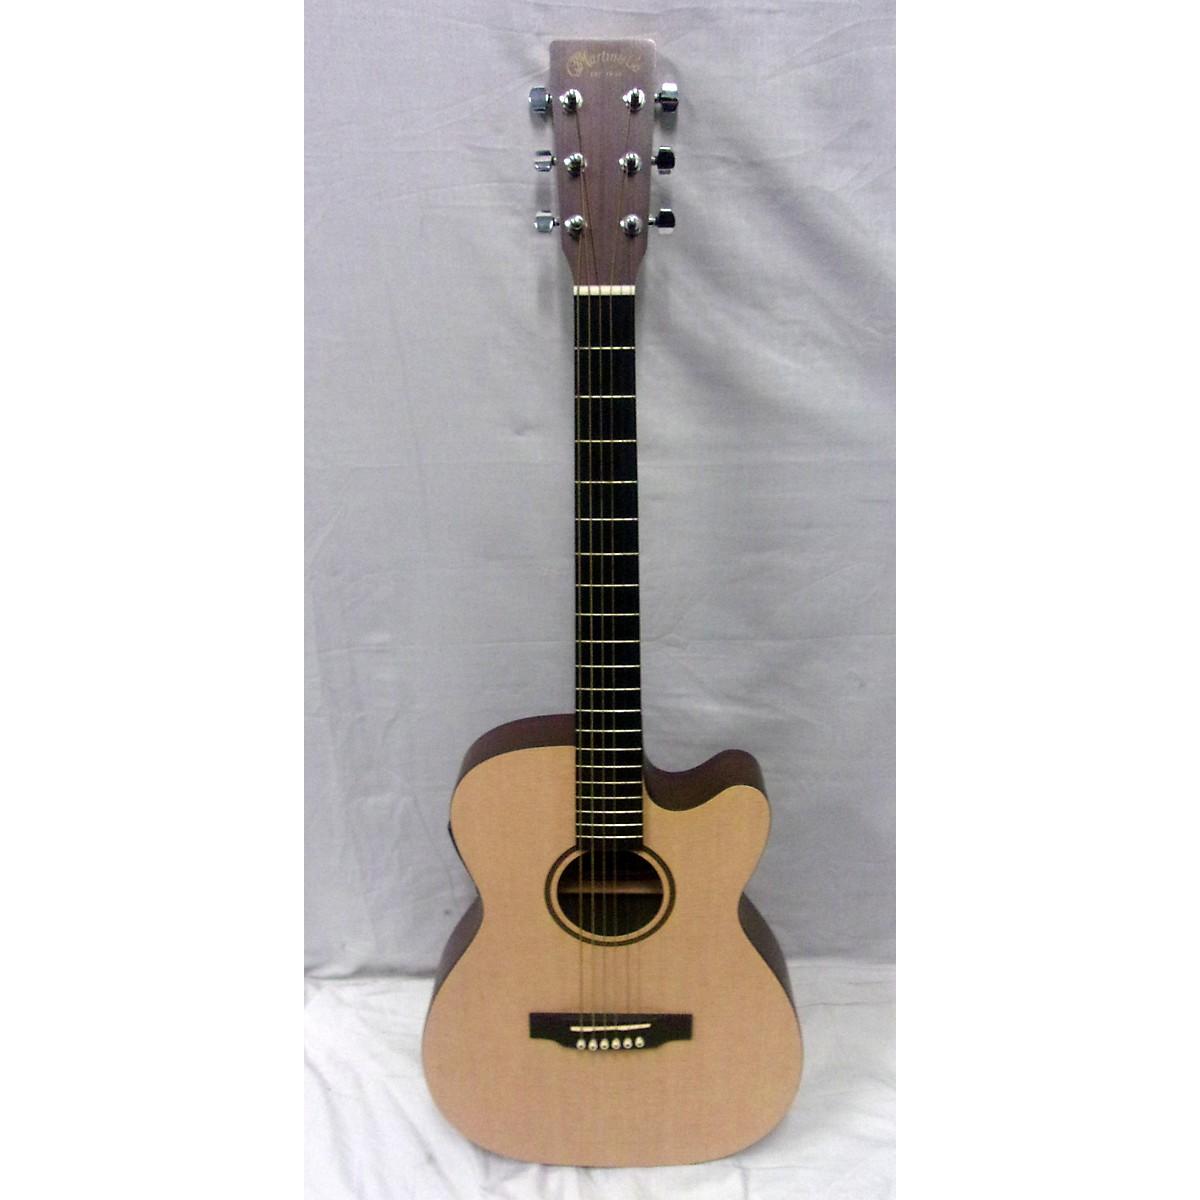 Martin 00cxrae Acoustic Electric Guitar